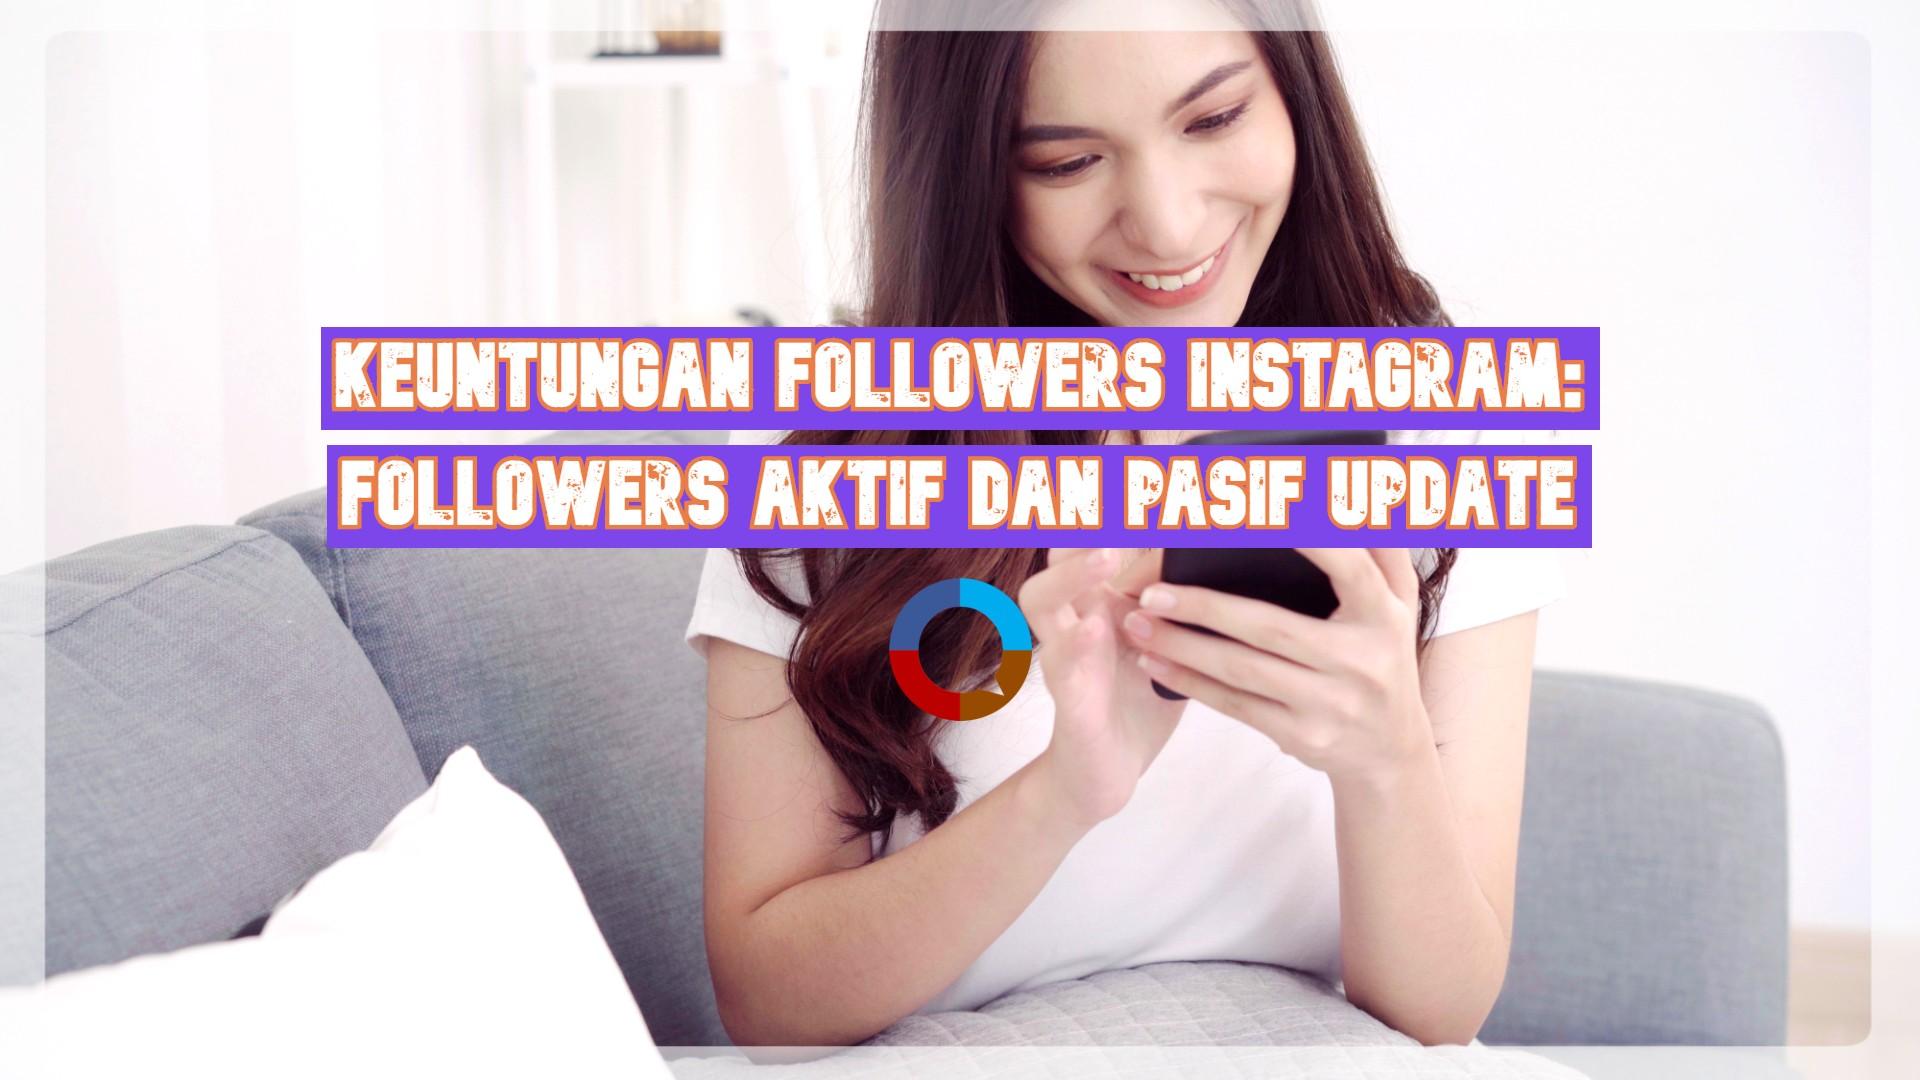 Keuntungan Followers Instagram: Aktif dan Pasif Update